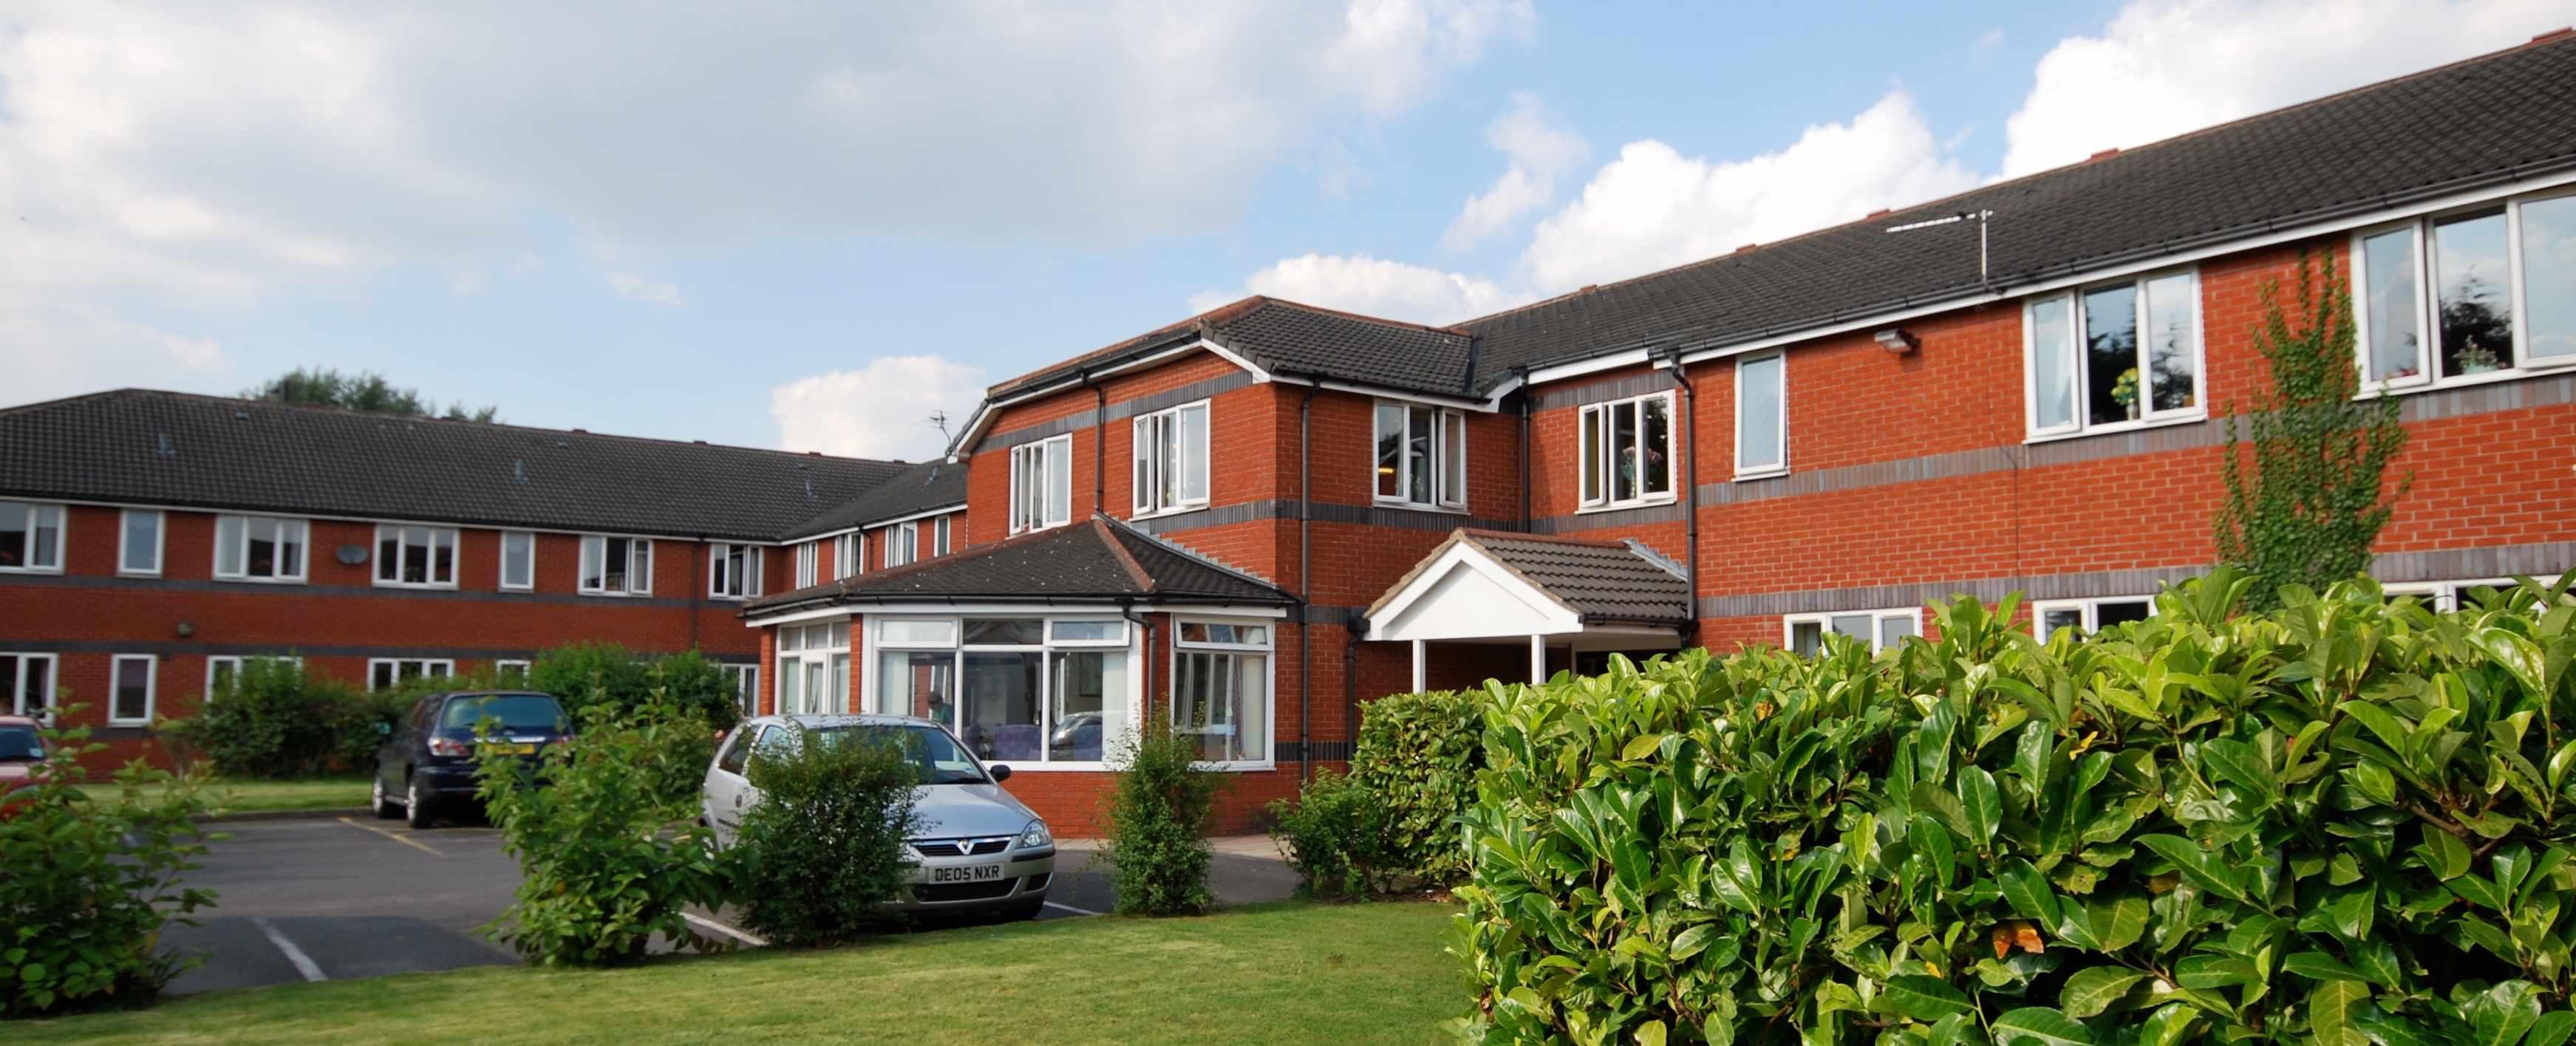 Acorn Lodge Nursing Home Manchester